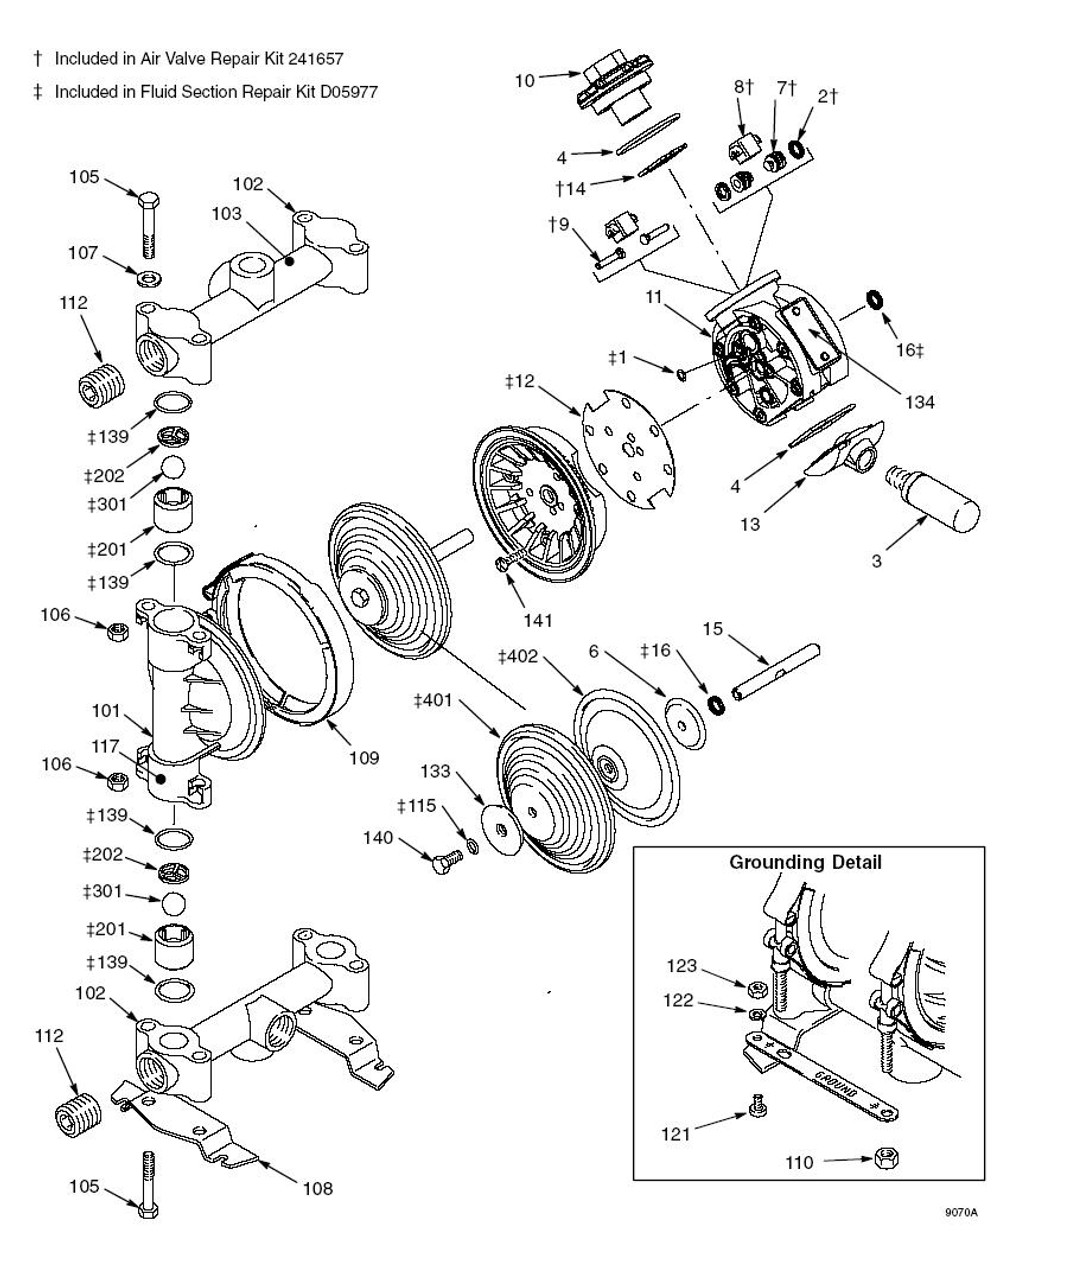 Graco husky 515 716 diaphragm pump parts john m ellsworth co inc graco husky 515 716 diaphragm pump parts ccuart Gallery